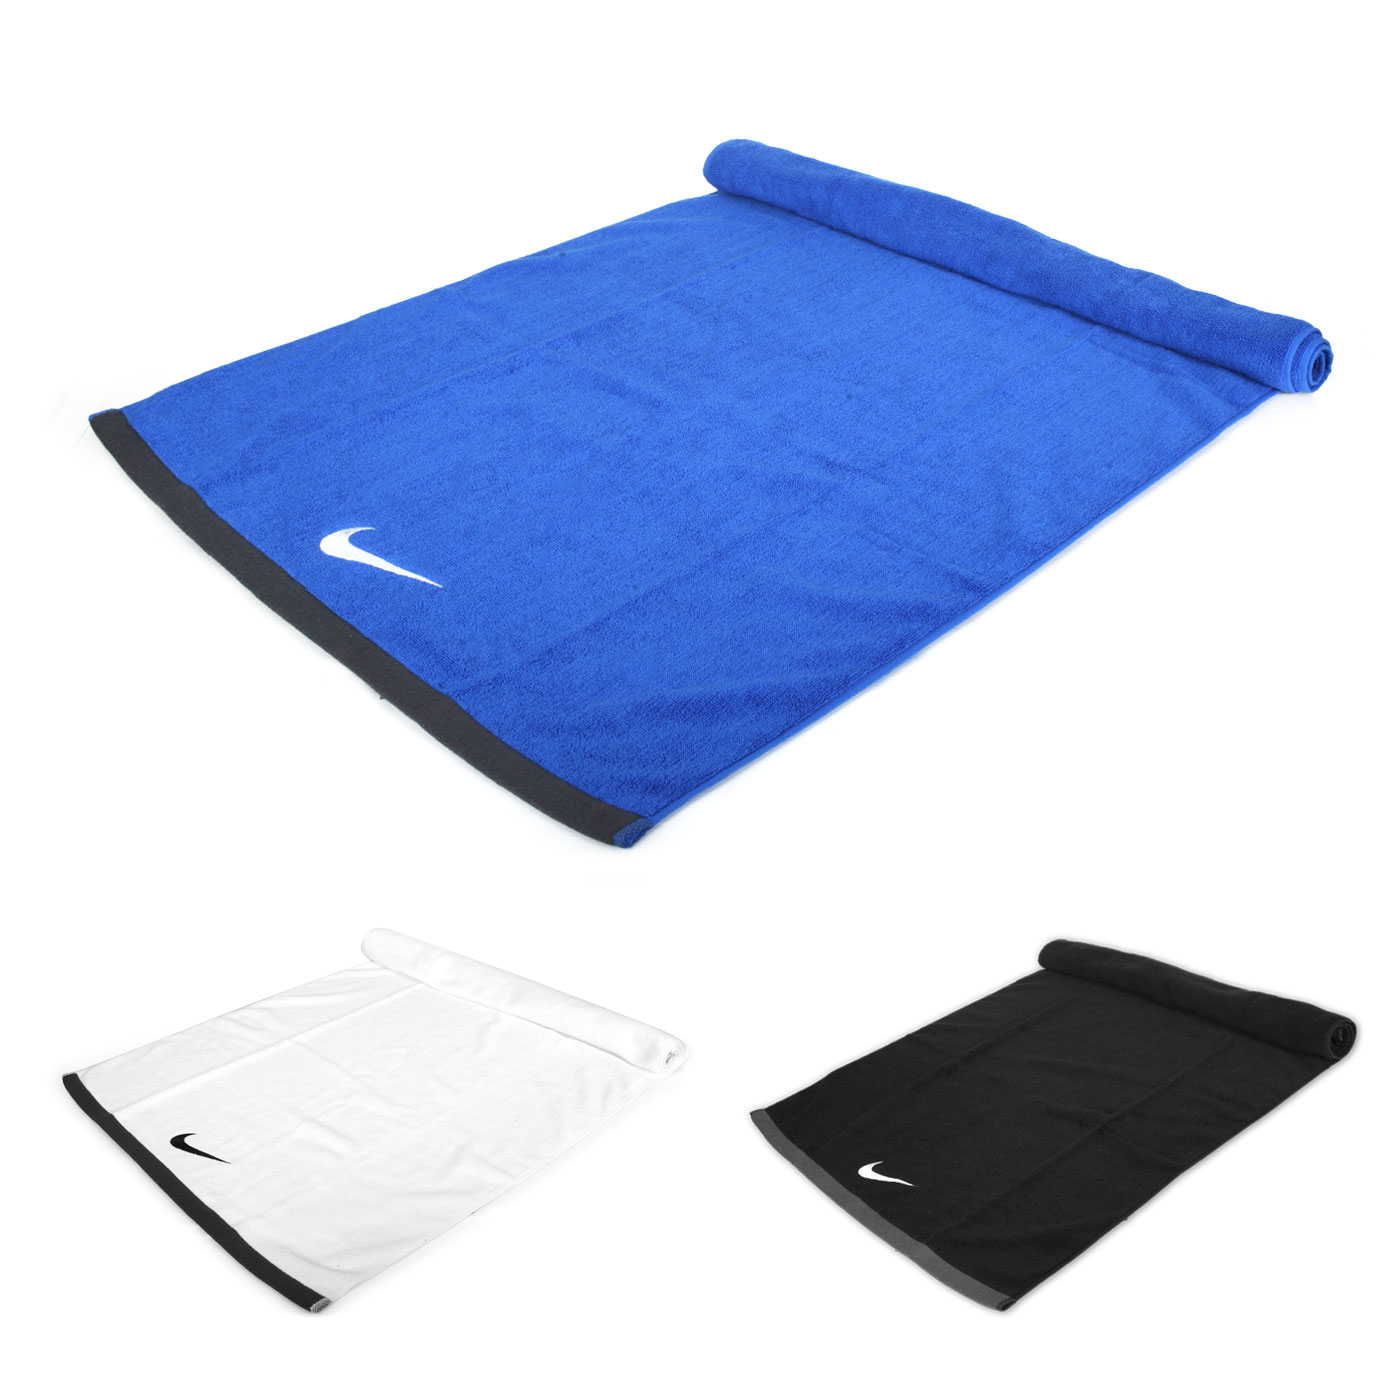 NIKE 運動大浴巾(60*120cm) N1001522010LG